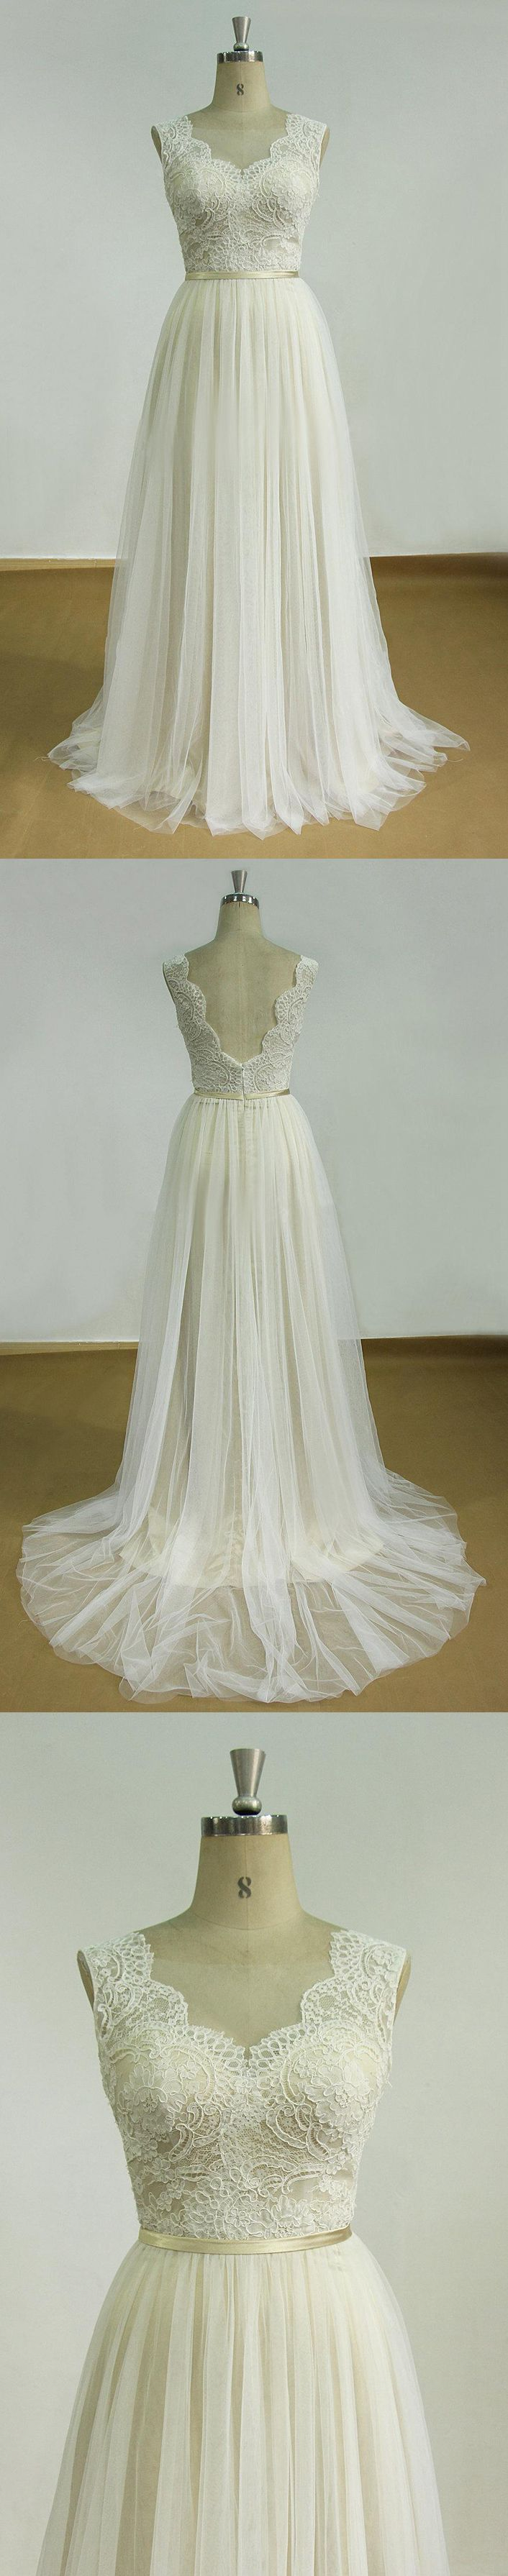 Backless tulle lace satin weddig dress wedding dress on mannequin